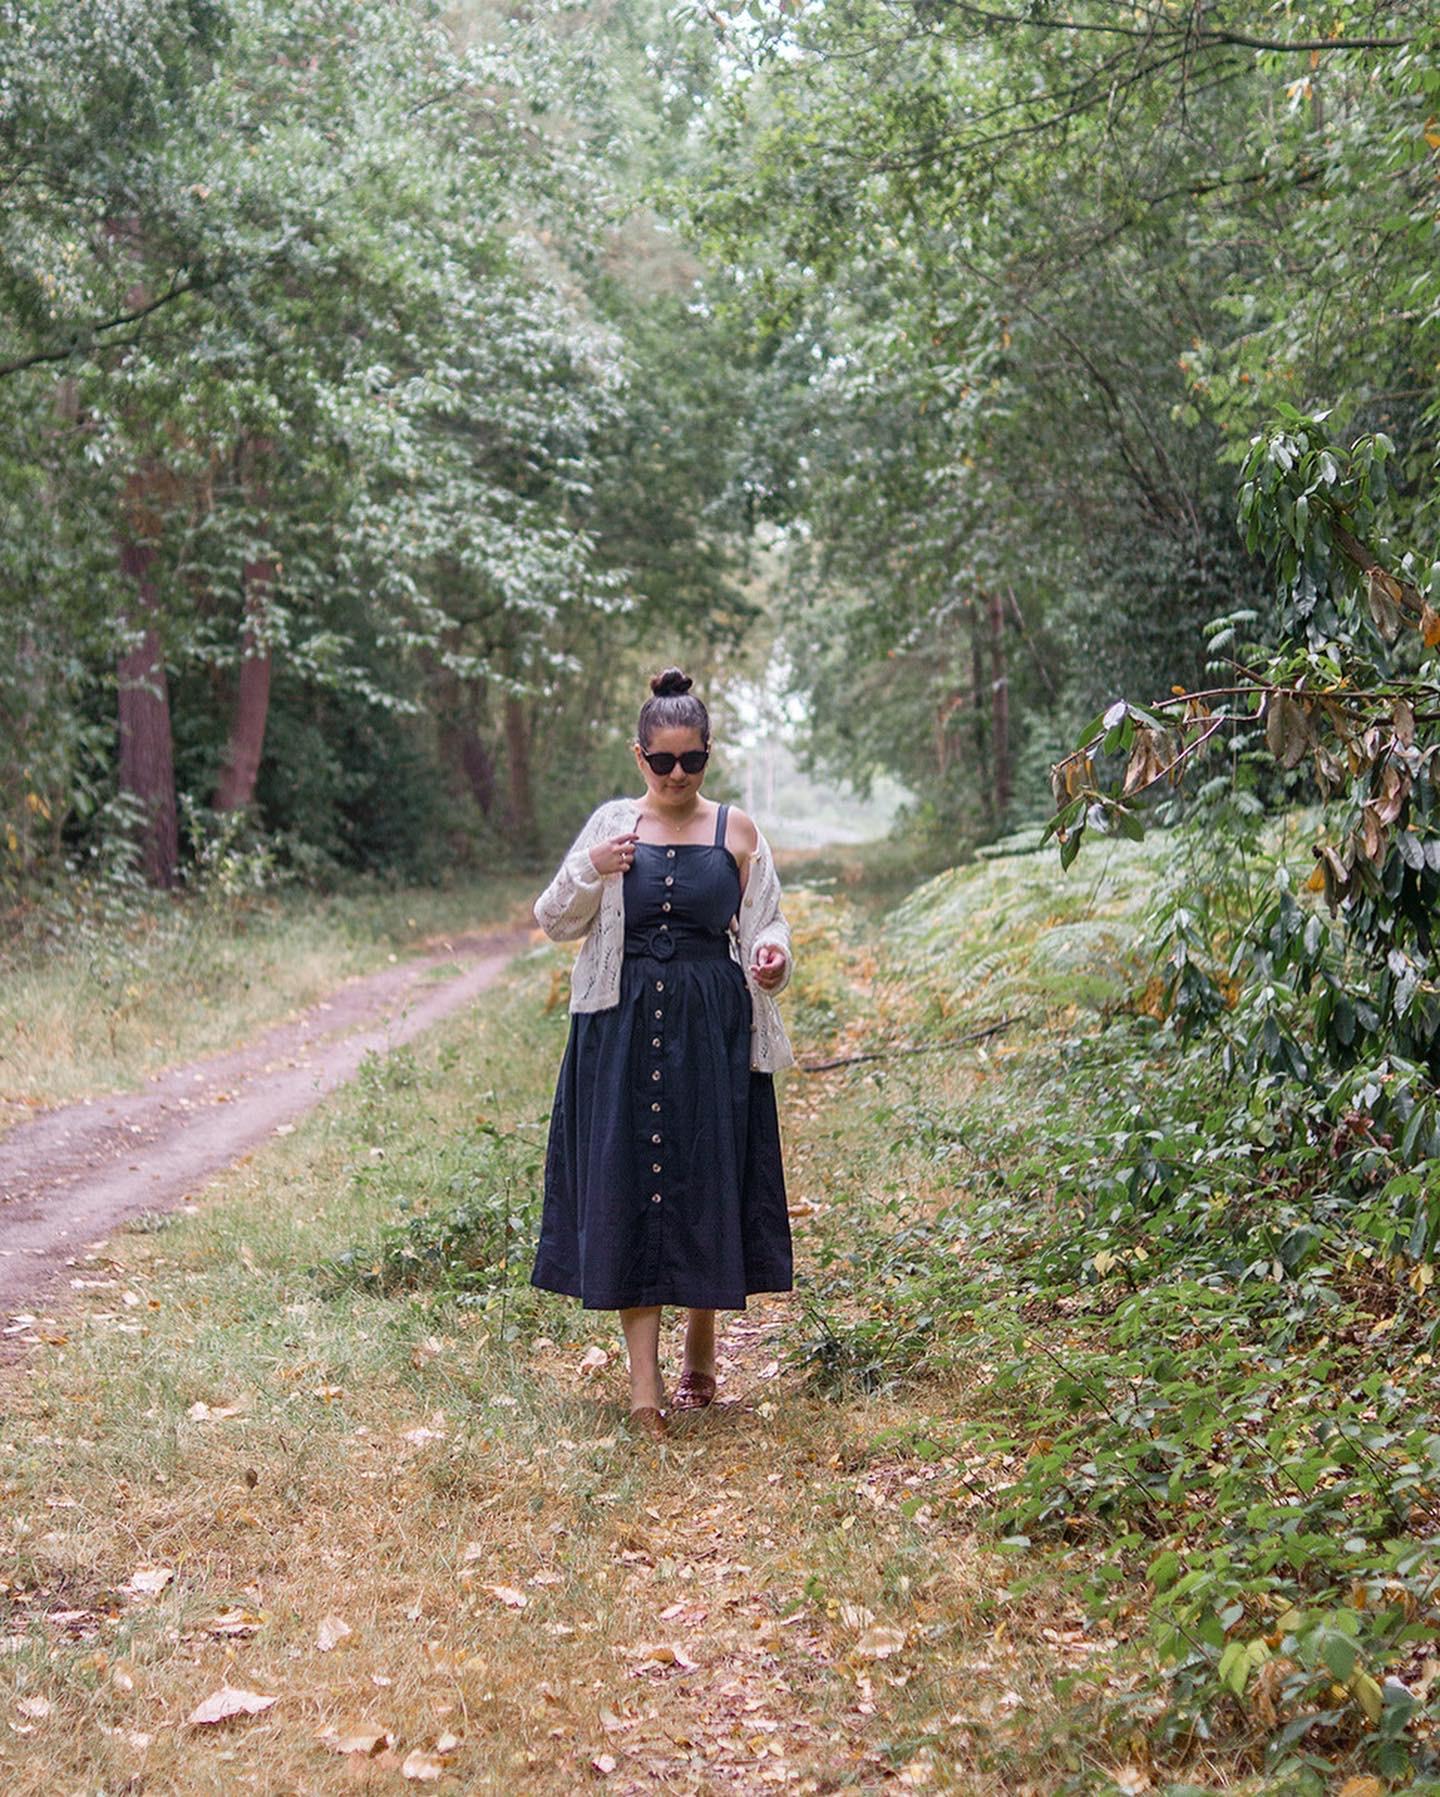 Midsize-classic-style-summer-dress